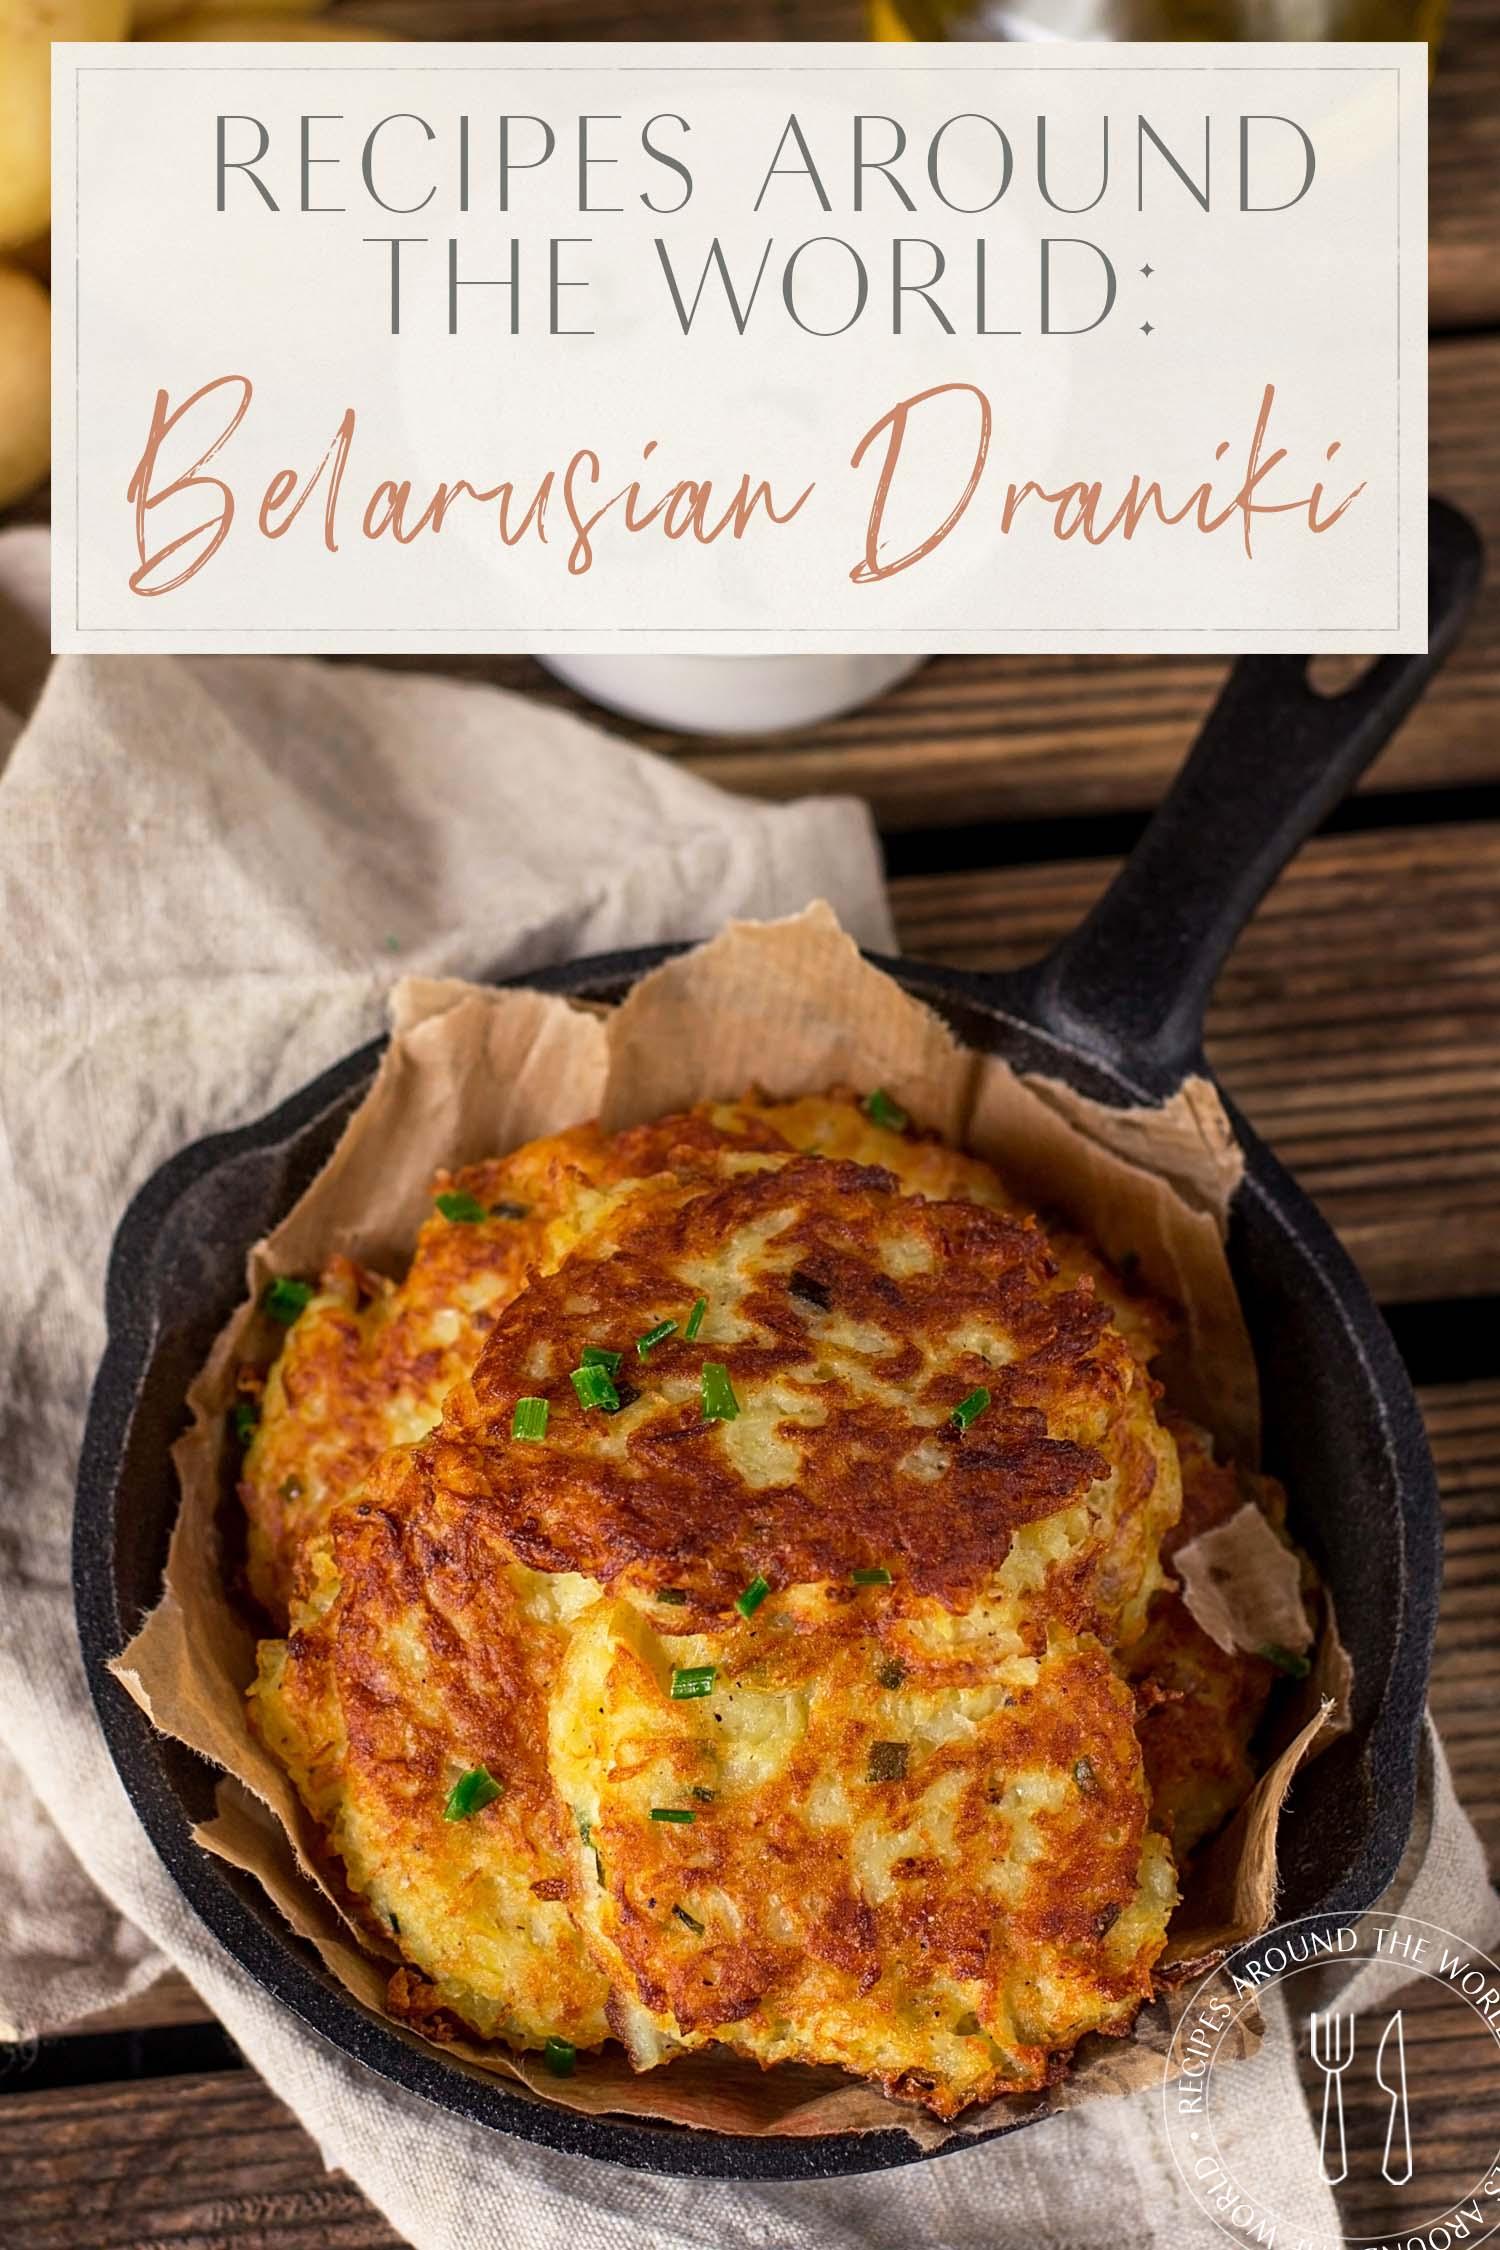 Belarusian Draniki Recipe